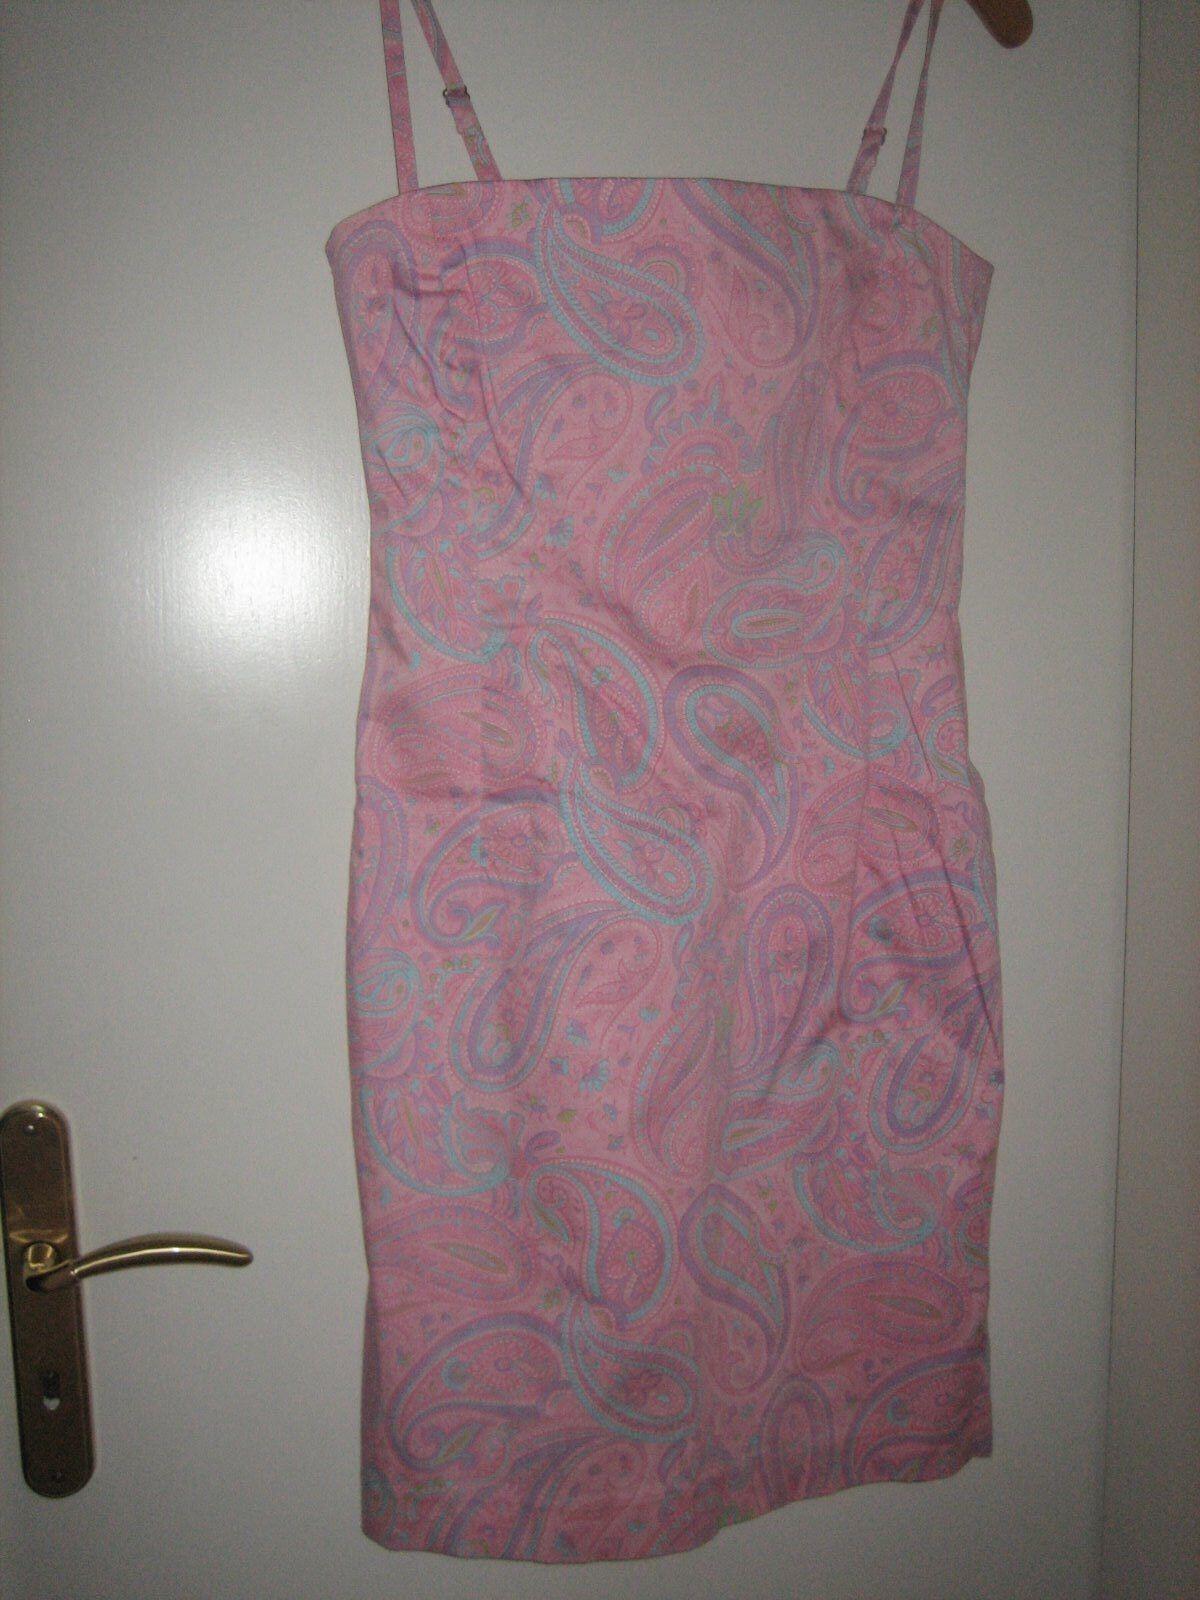 Kleid Corsagenkleid Jones New York Signature Rosa Rosa flieder türkis Gr. 36 neu